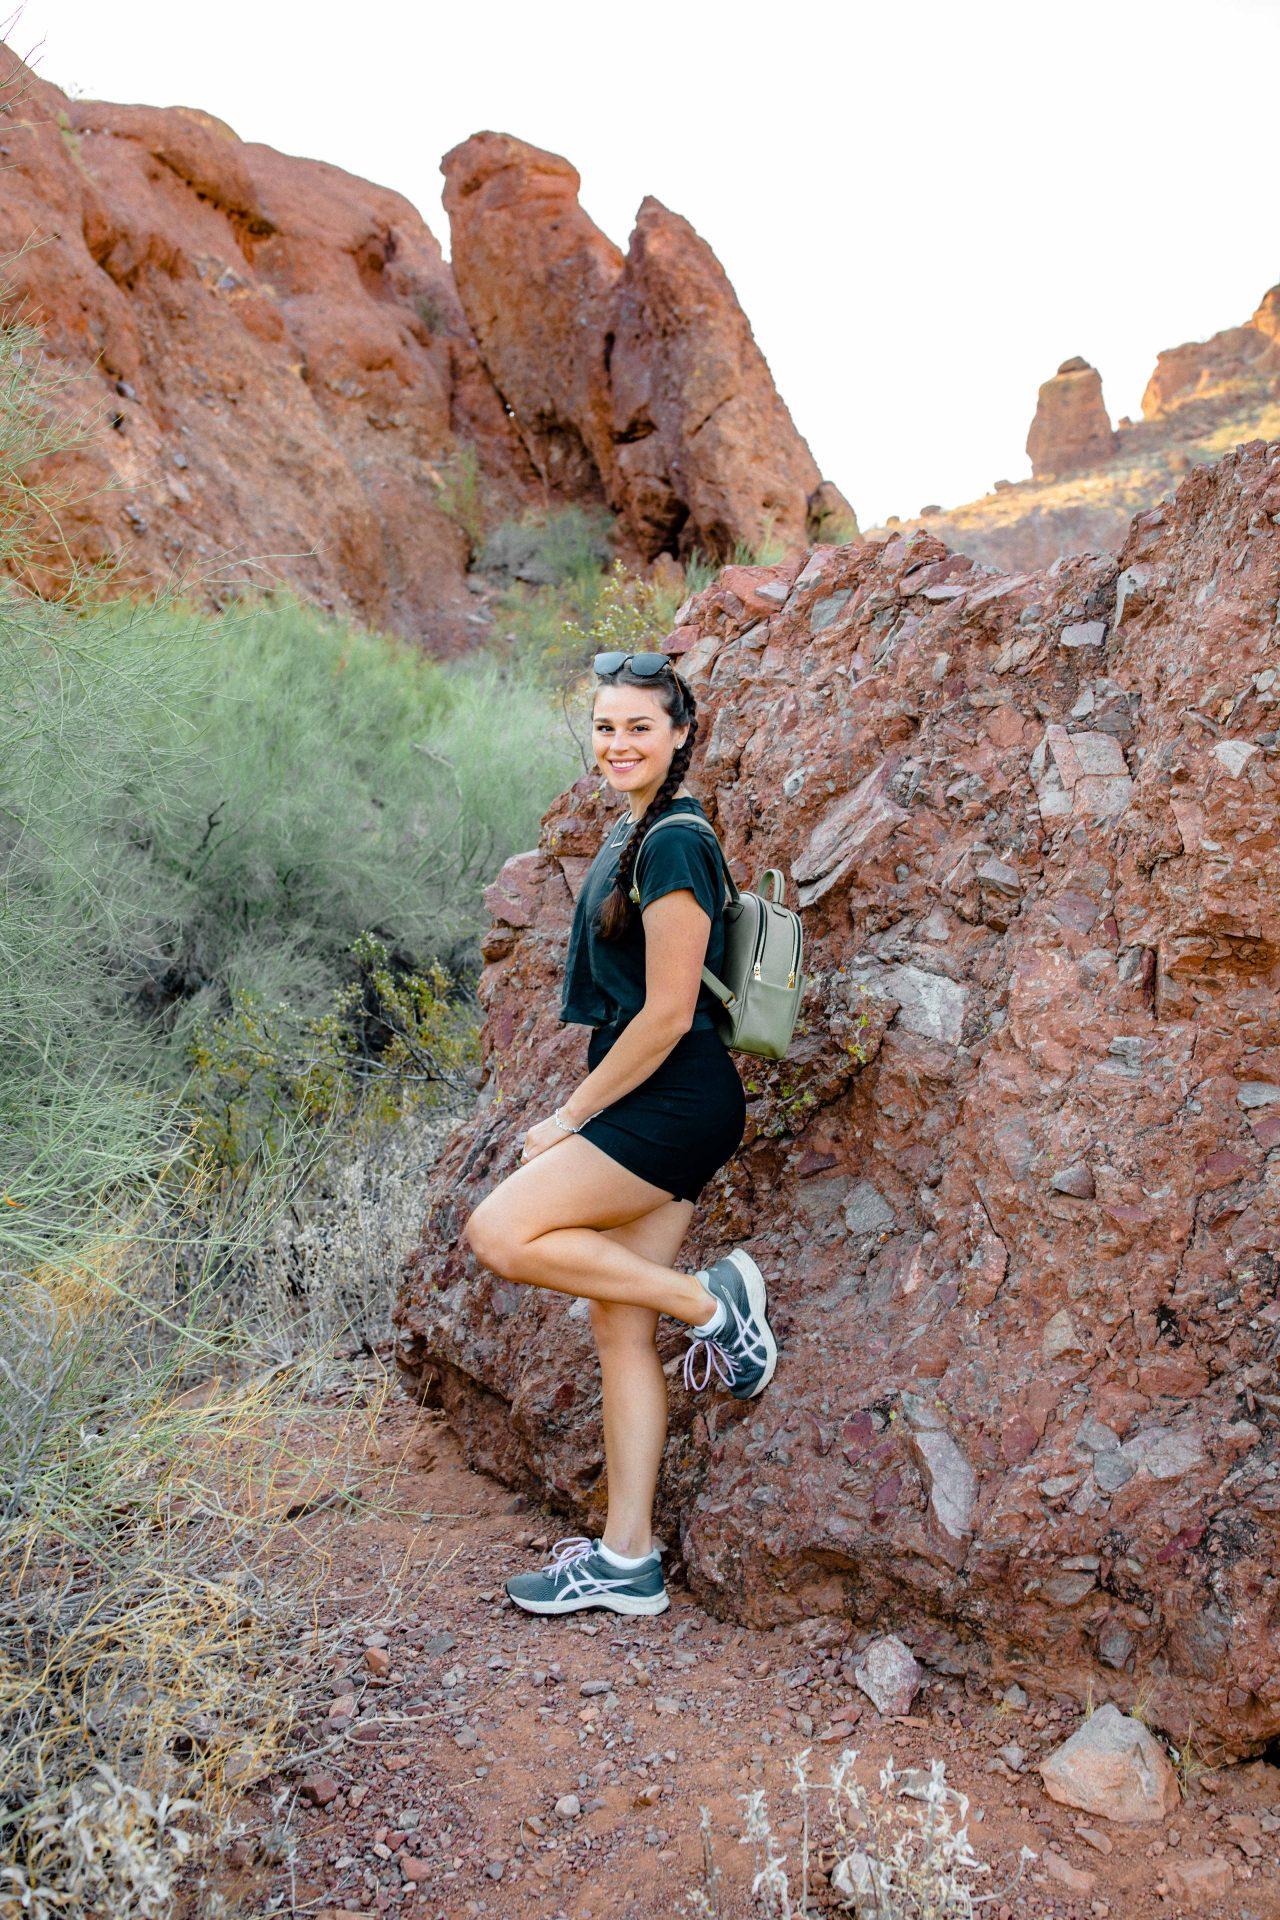 what to do in scottsdale Arizona, travel blog scottsdale Arizona, scottsdale az, hiking, camel back mountain, hiking trail, things to do in scottsdale travel blog